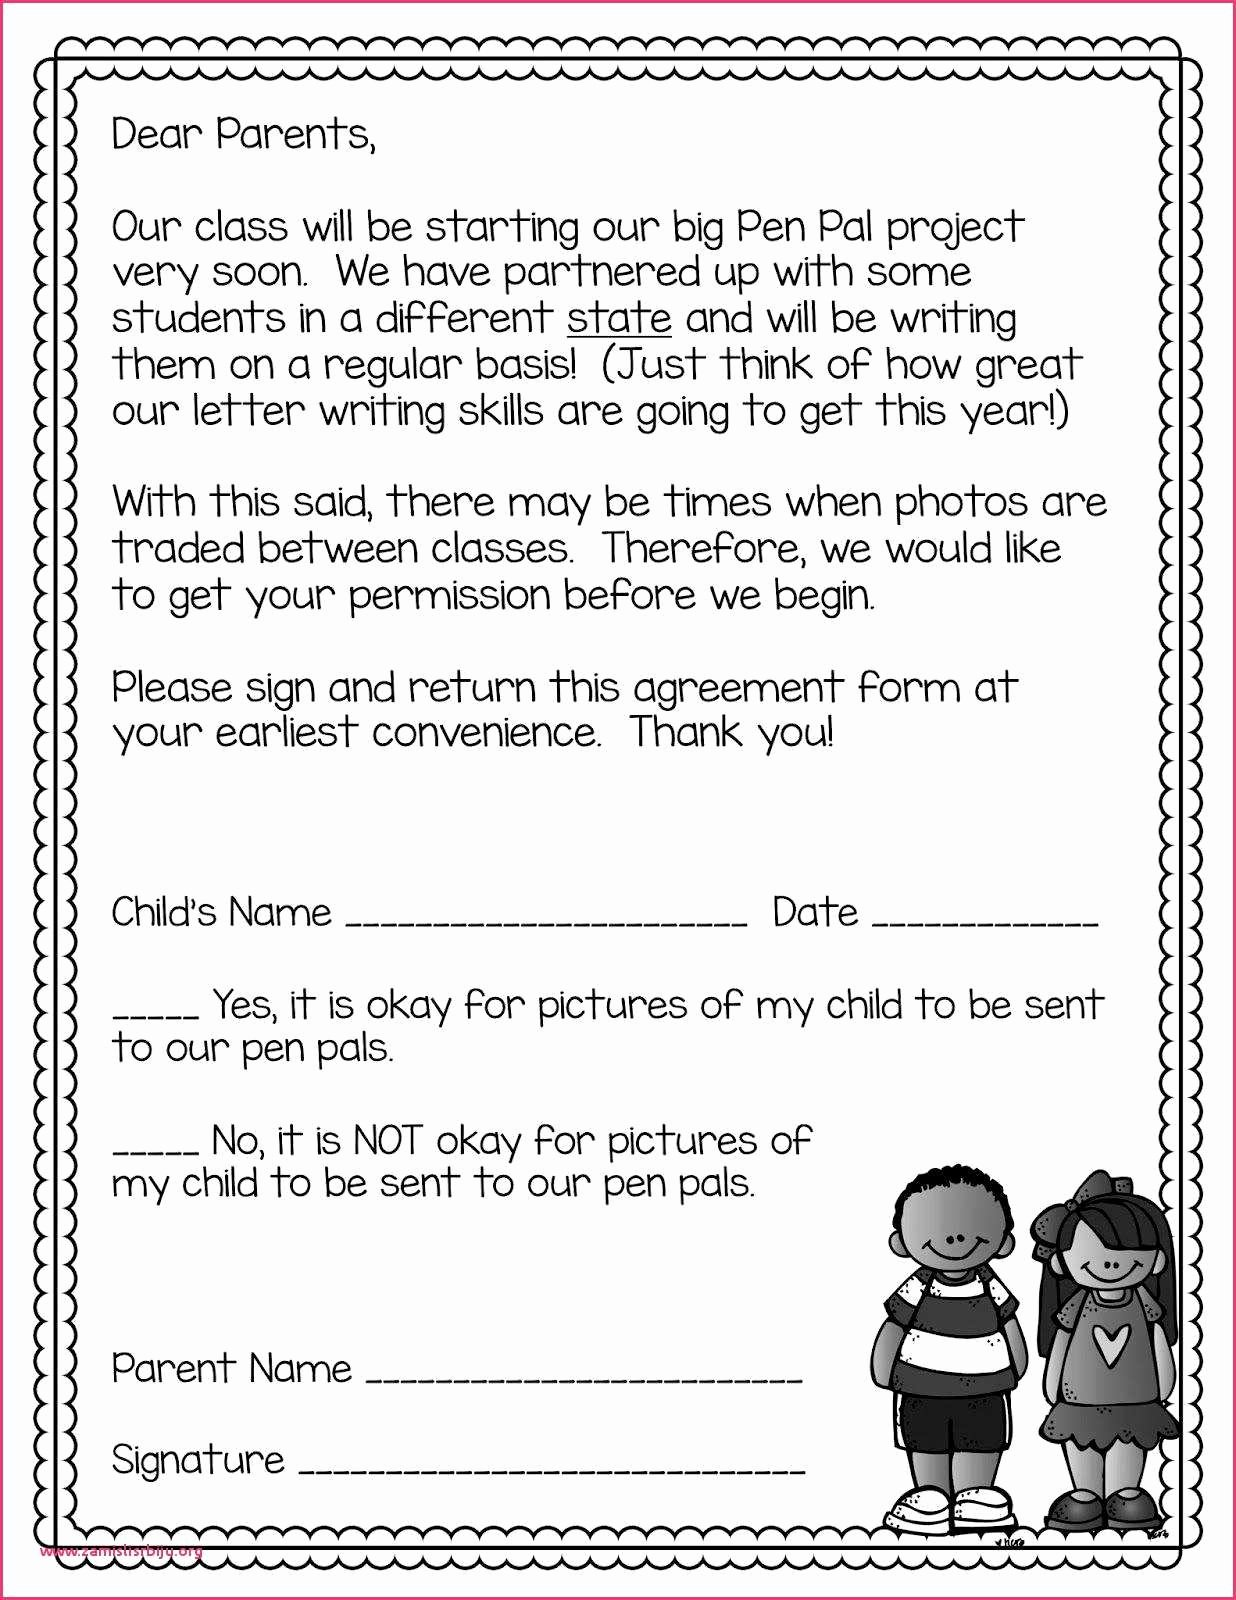 Pen Pal Letter Template Fresh Writing A Letter to A Penpal Example Pen Pal Letter